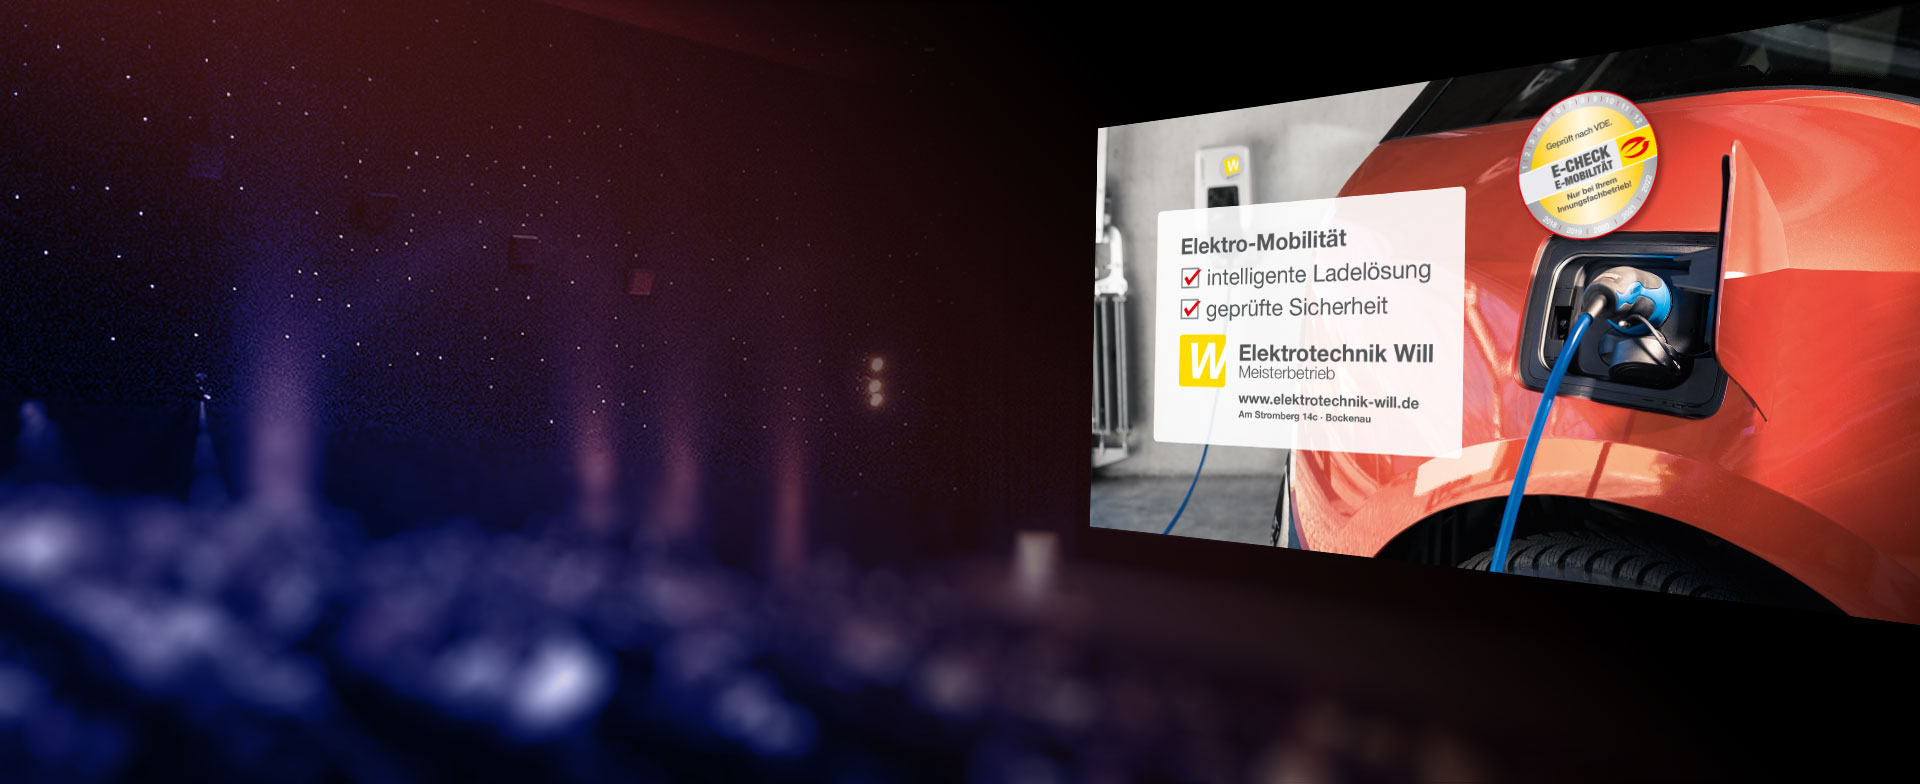 Kinowerbung für Elektrotechnik Will in Bockenau